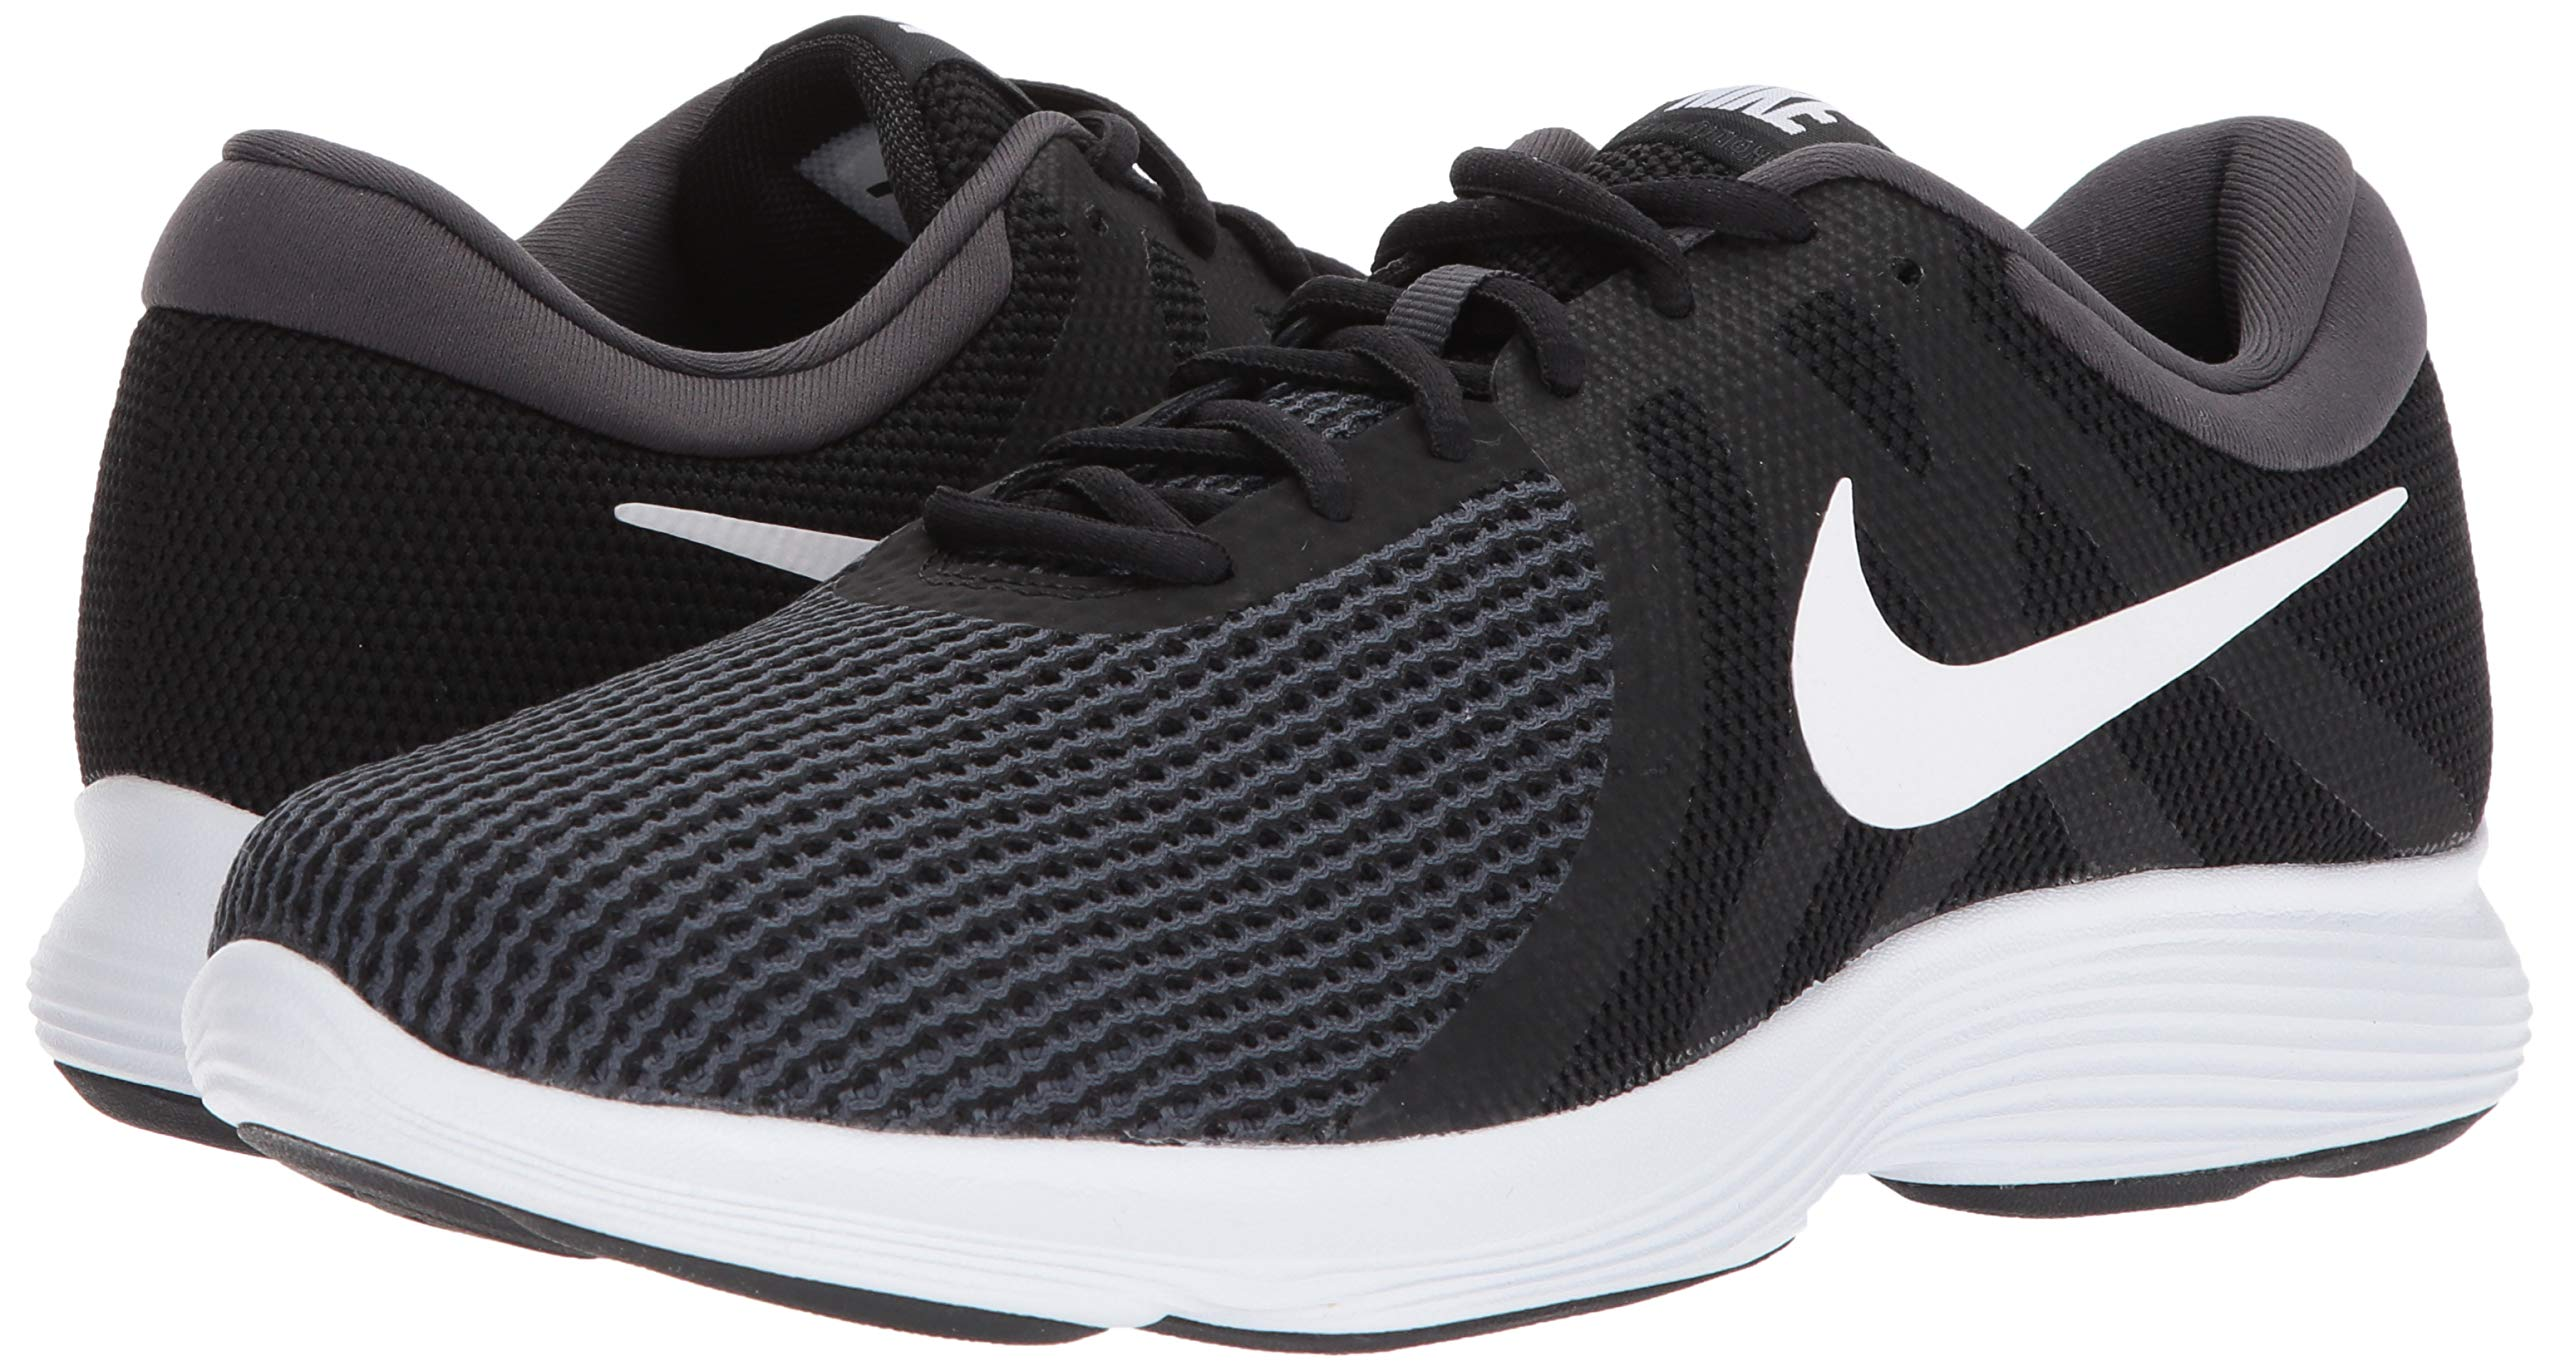 Nike Men's Revolution 4 Running Shoe Black/White - Anthracite 6.5 Wide US by Nike (Image #6)